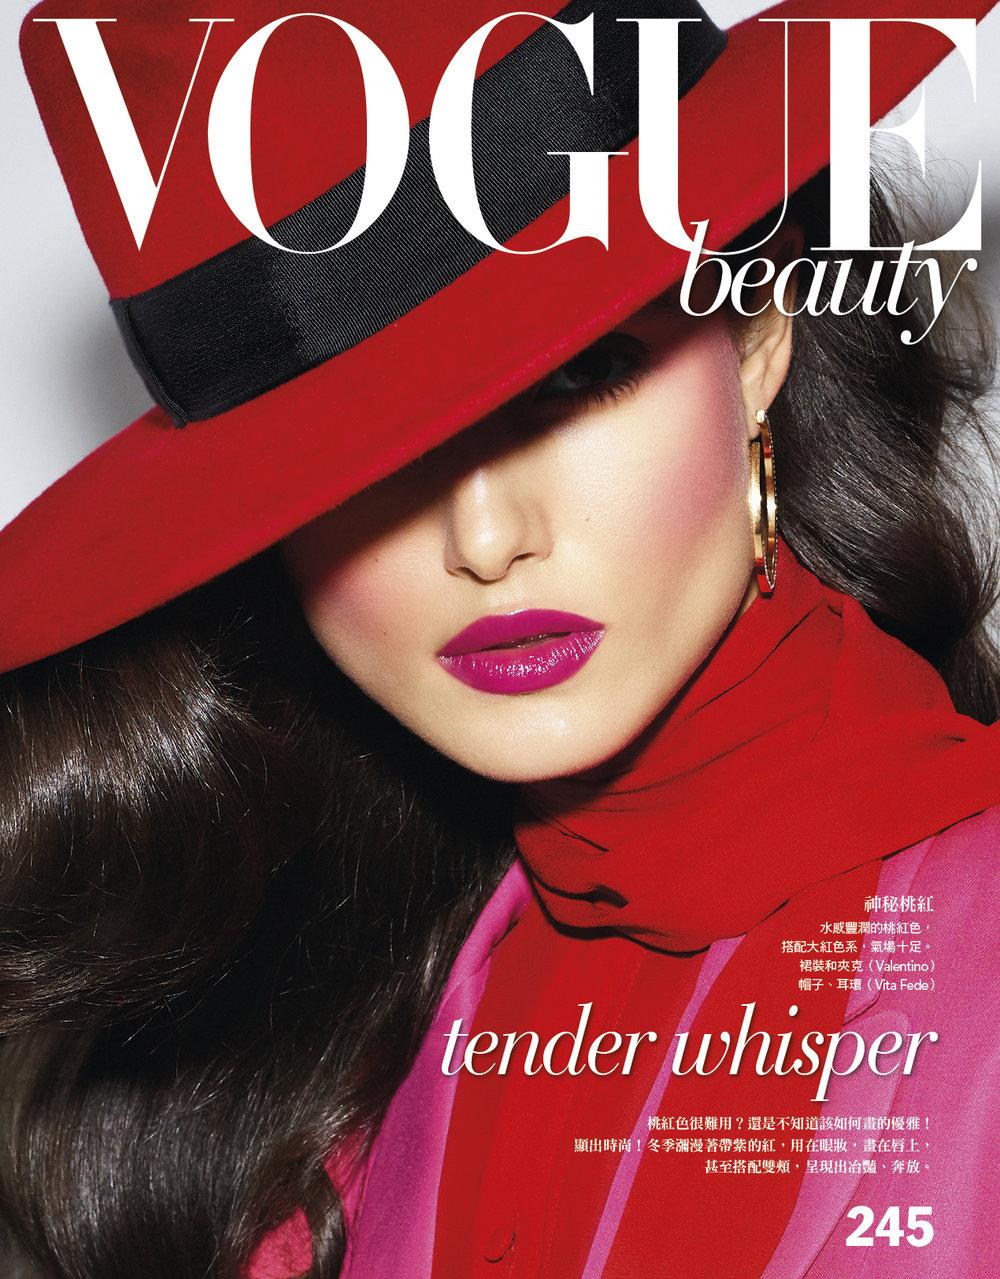 Blanca Padilla for VOGUE Taiwan by Enrique Vega [Layout]1.jpg